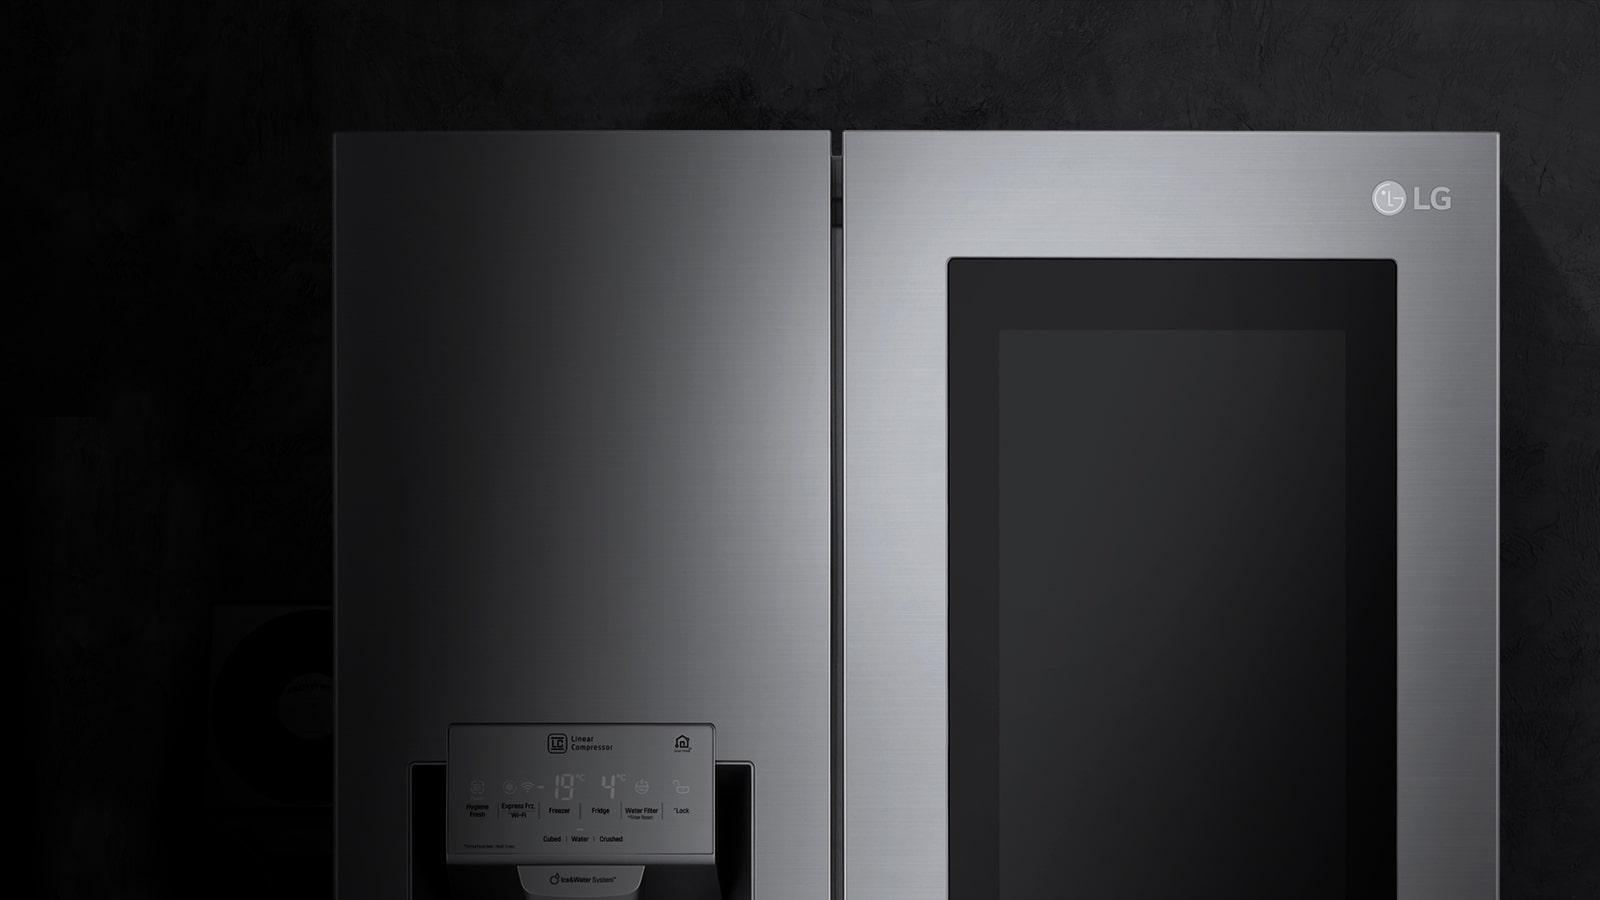 InstaView Door-in-Door™/ph/images/RF/features/GR-X247CSAV-side-by-side-refrigerators_InstaView-DID_D_close-v1-1.jpg